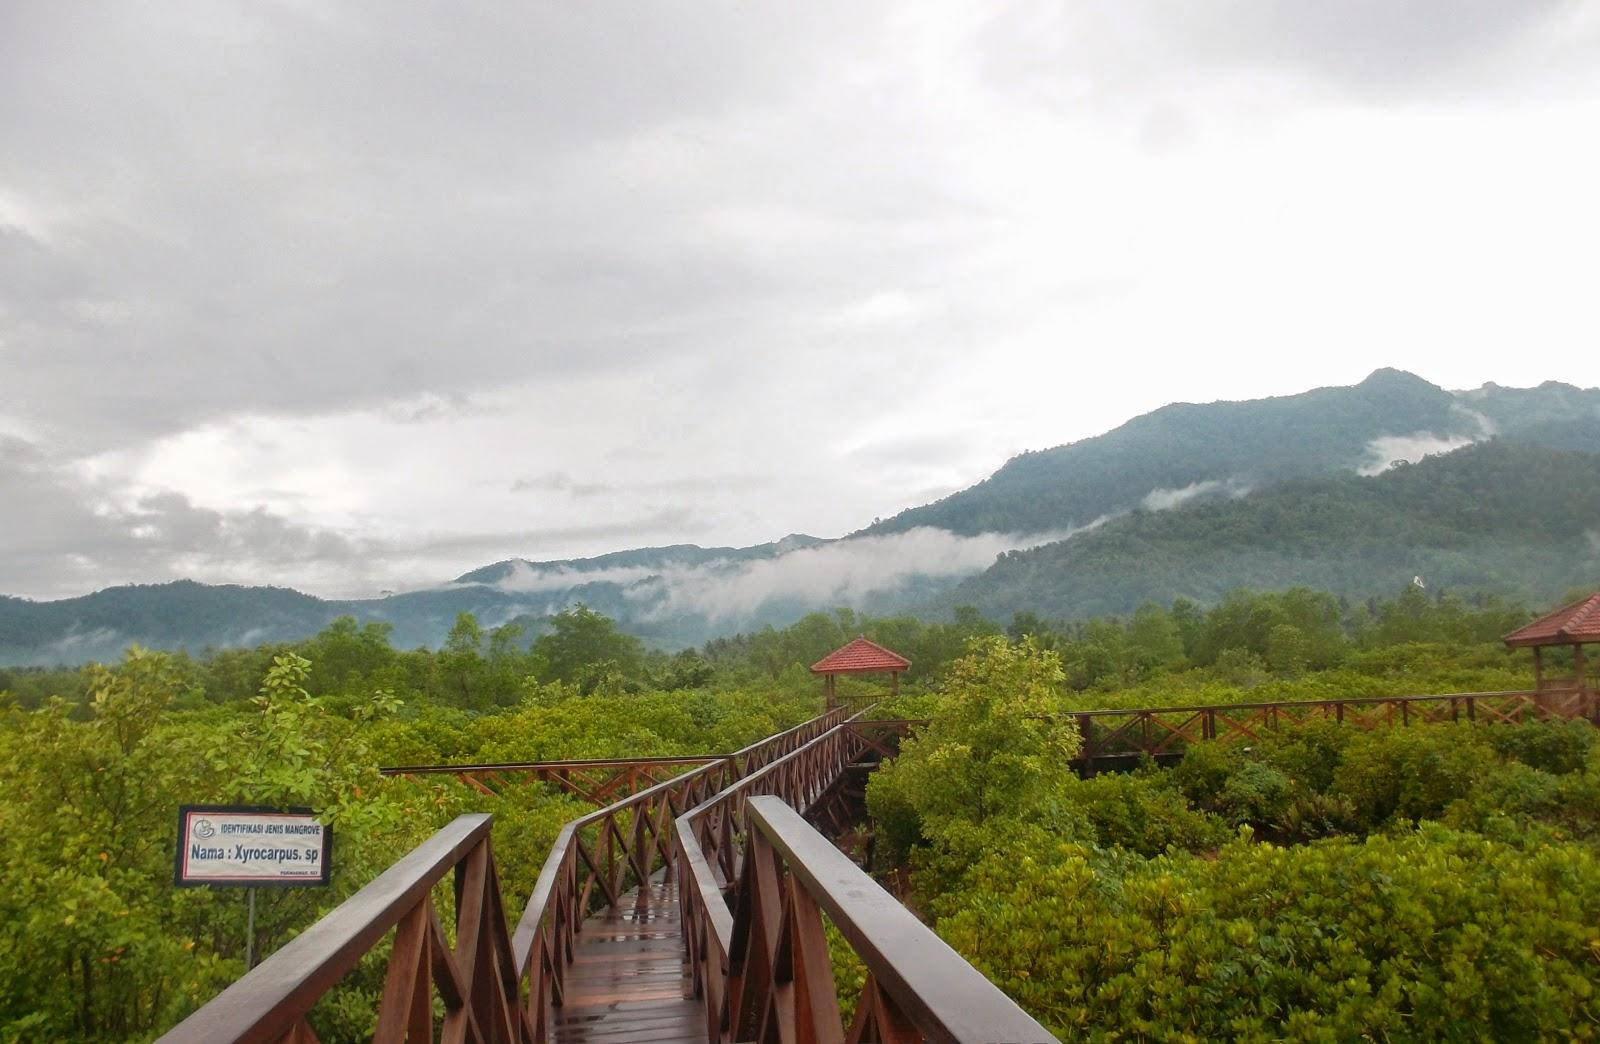 Jpg Taman Wisata Mangrove Hutan Pancer Cengkrong Kab Trenggalek